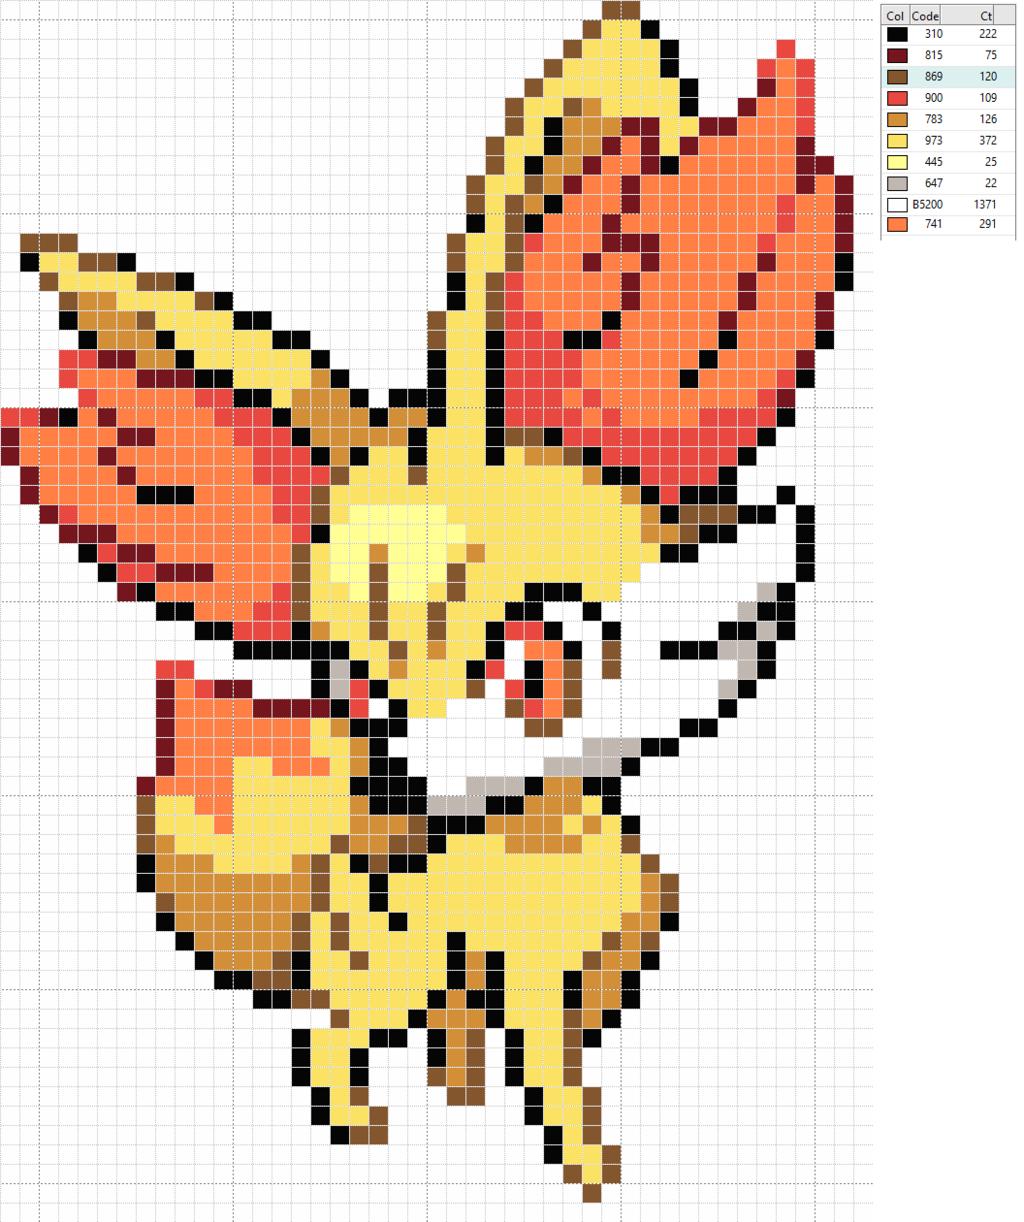 Minecraft Pokemon Pixel Art Templates Piplup Galleryhip Com Pixel Art Pokemon Pixel Art Minecraft Coloriage Pixel Art